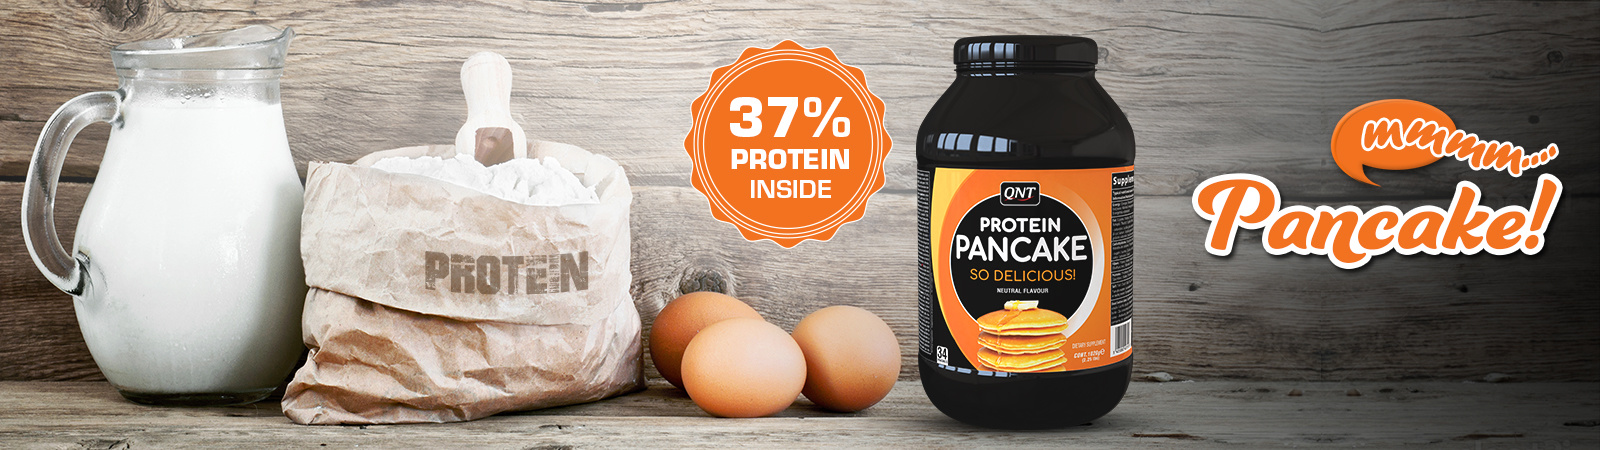 QNT Protein Pancake Banner